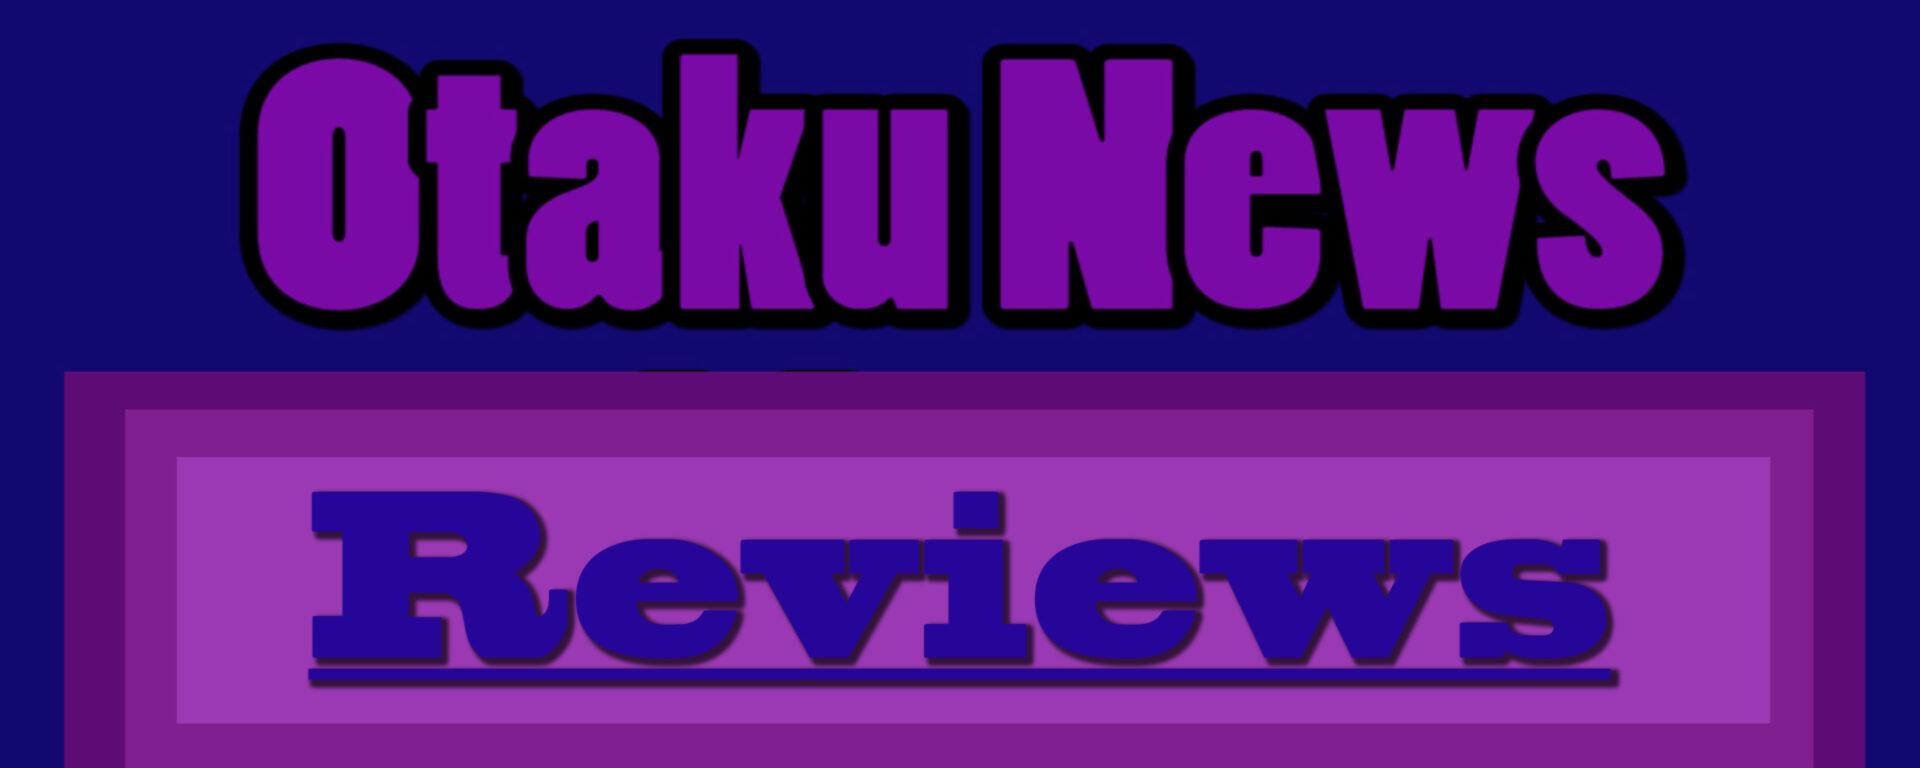 Asadora! Volume 1 by Naoki Urasawa – Otaku News Reviews